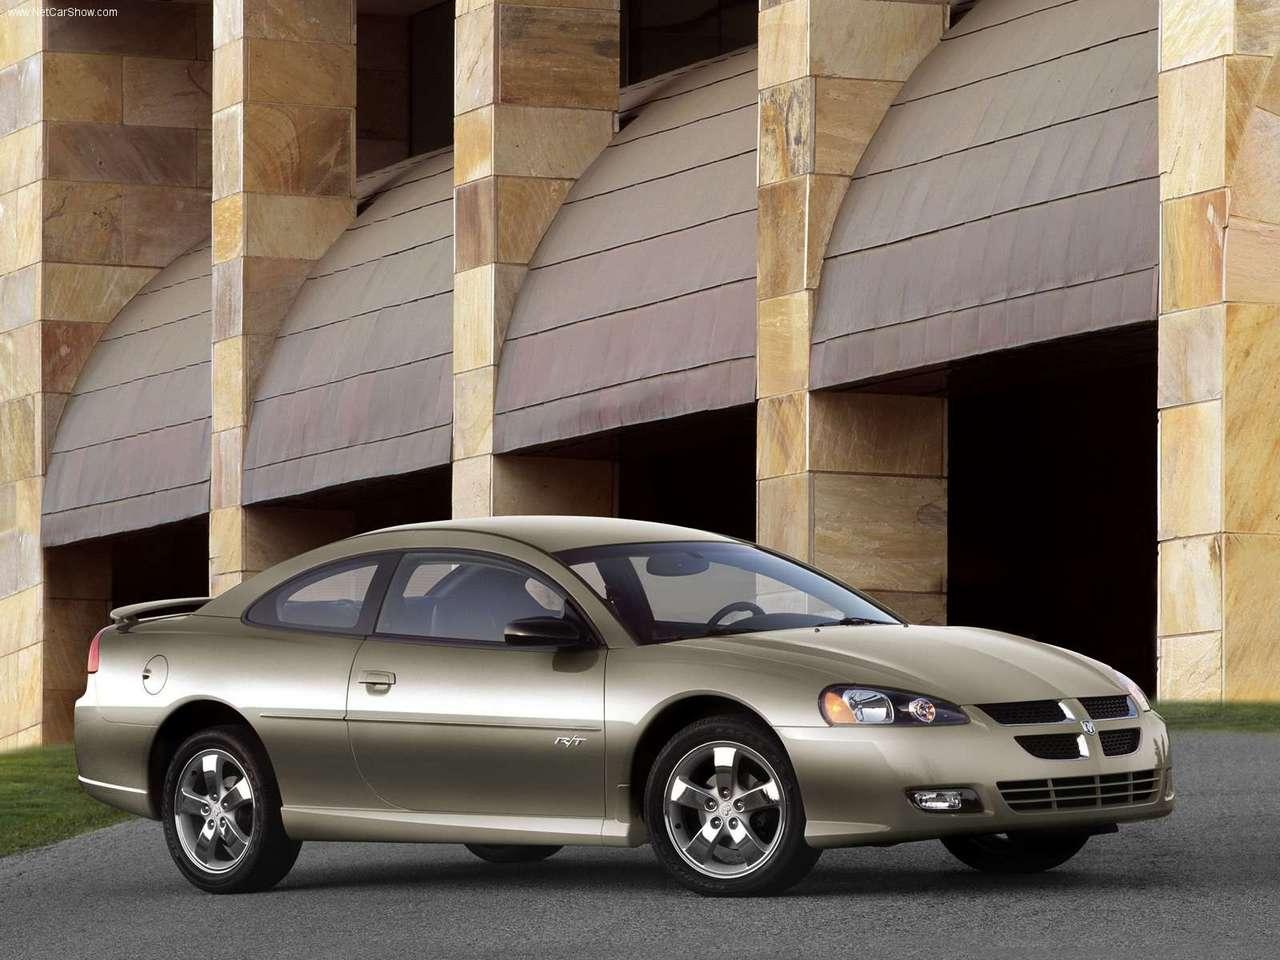 http://3.bp.blogspot.com/-0fJ2EuNYAeE/TXR7h94VwcI/AAAAAAAADkE/s0TVEpJ6ckE/s1600/Dodge-Stratus_Coupe_2005_1280x960_wallpaper_02.jpg